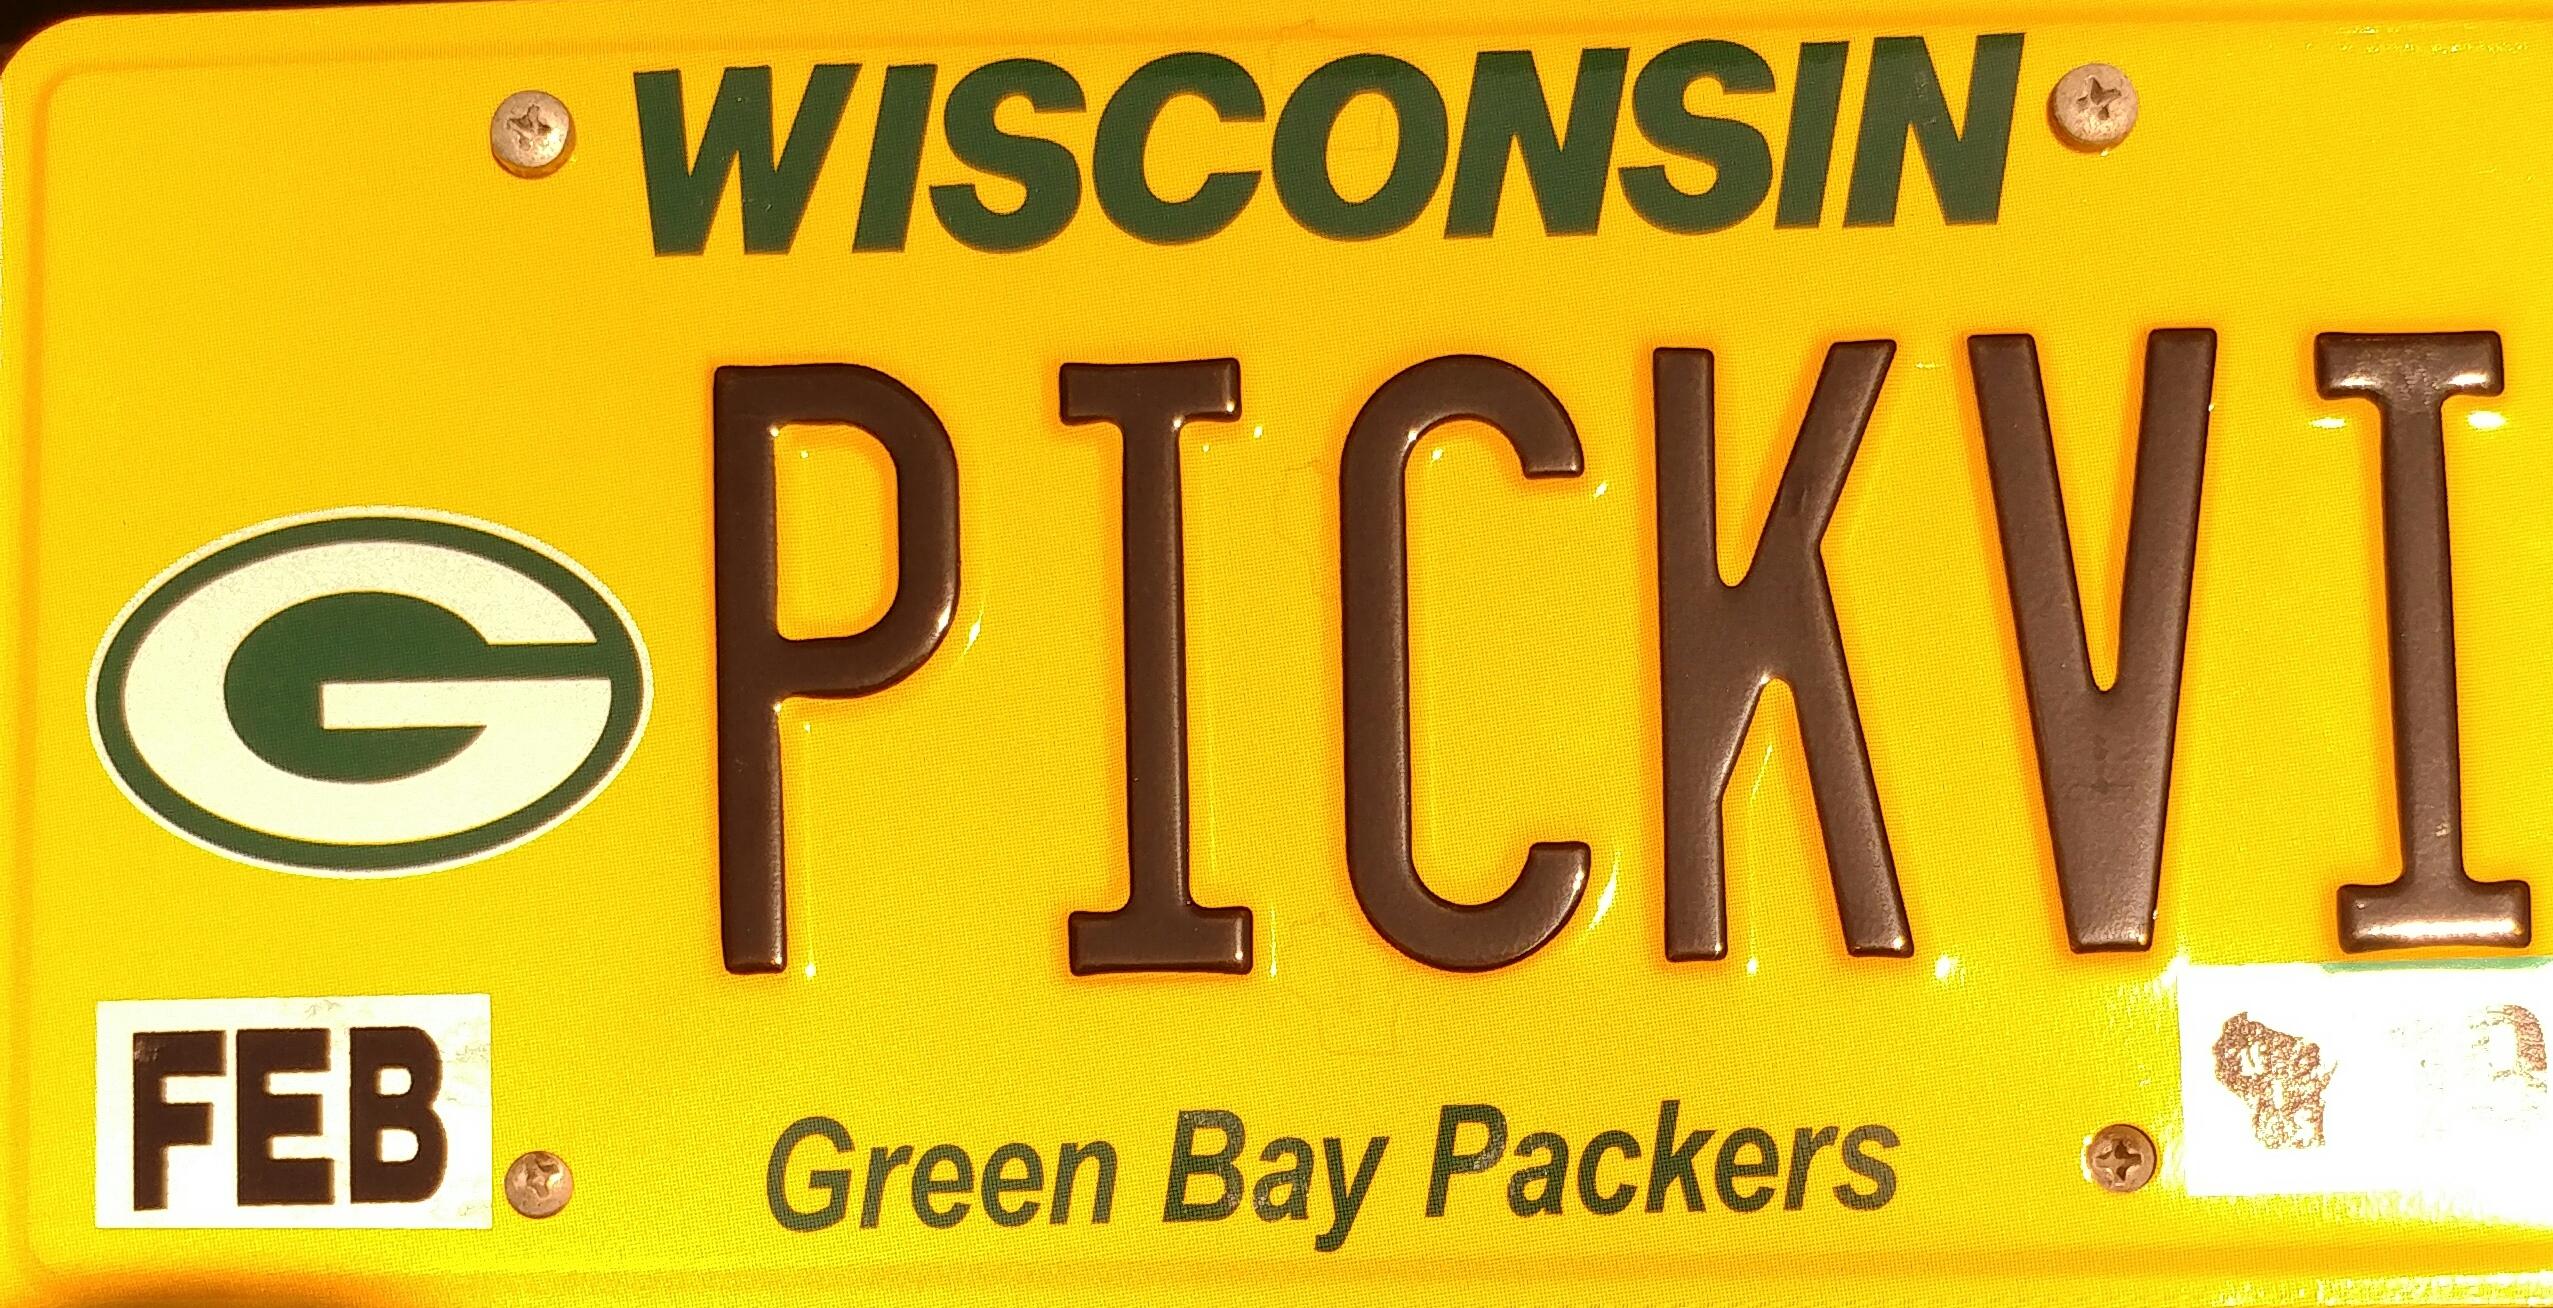 Green Bay Packers Preseason Chick Picks and Pick Sixes